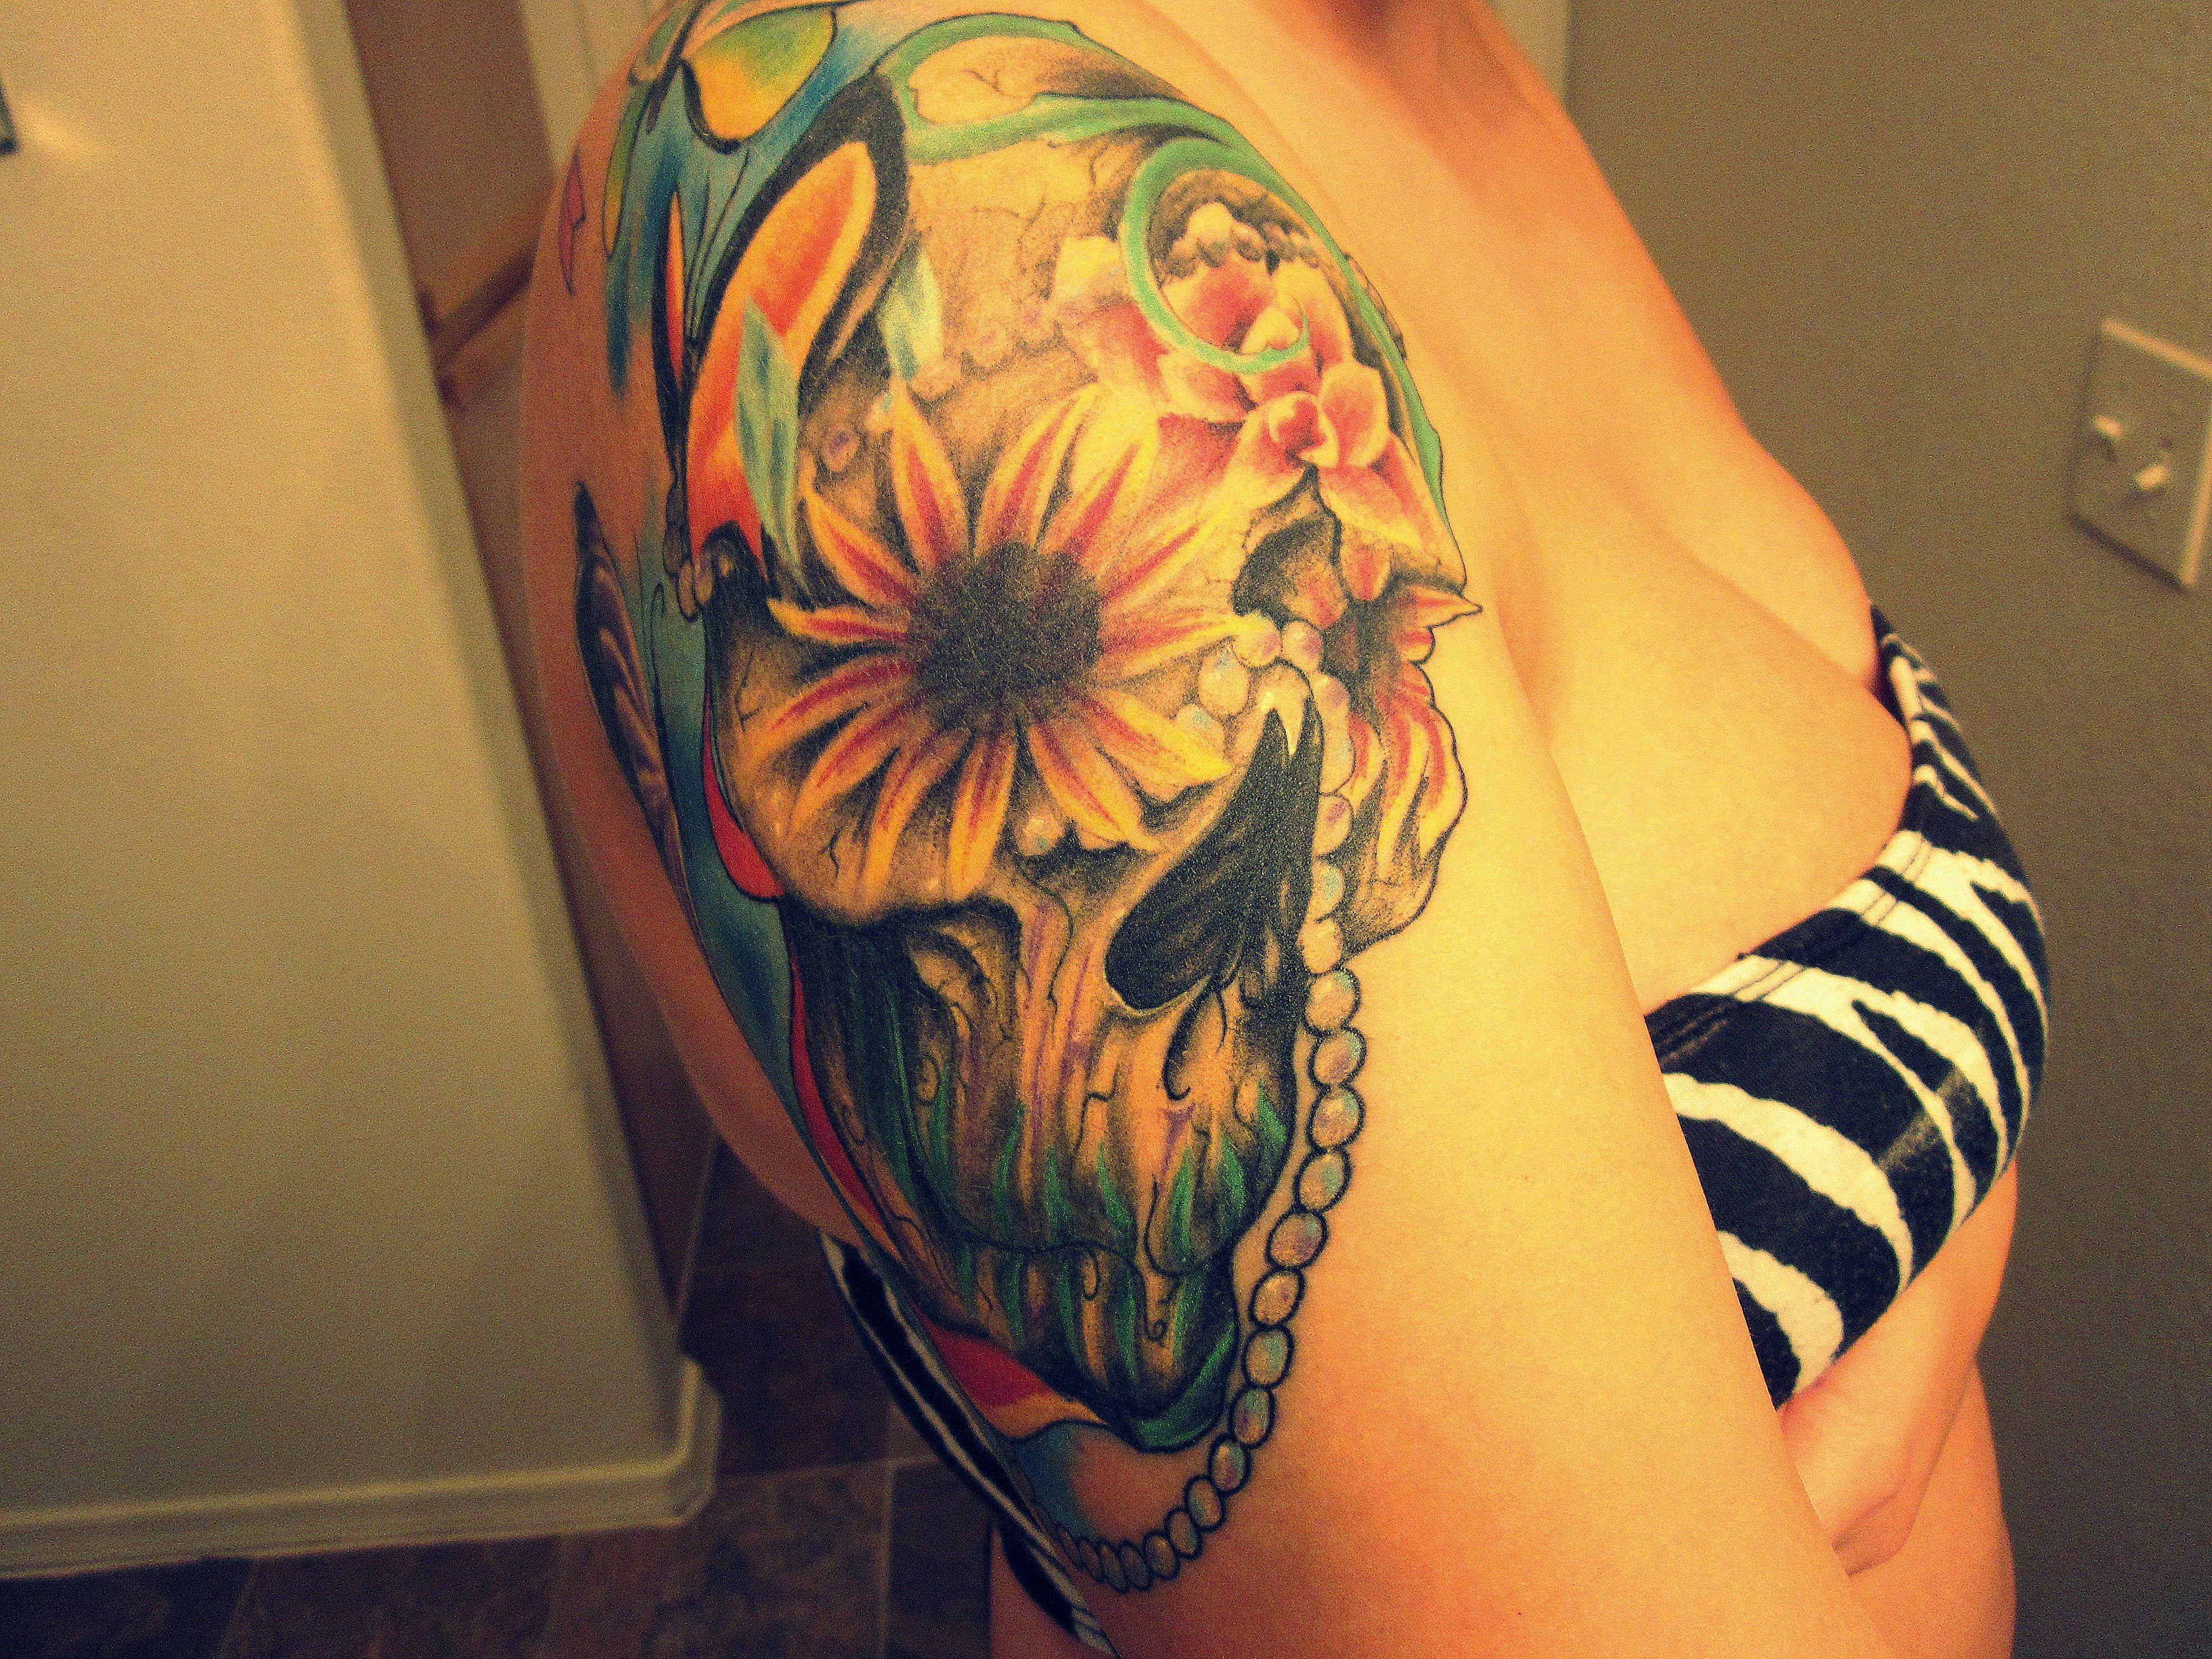 Flower skull tattoo Tattoos and other fancy stuff